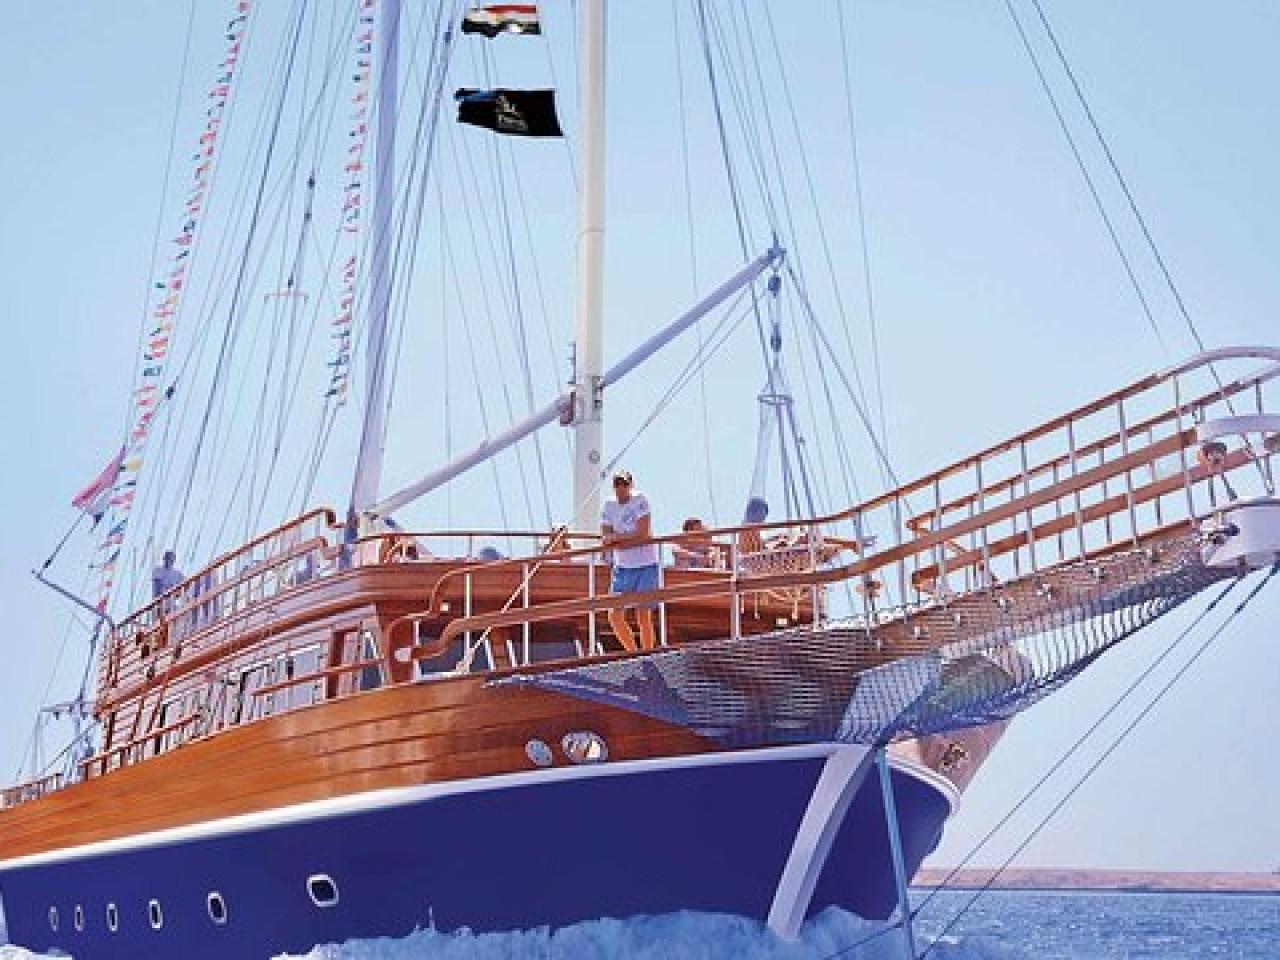 Pirates Luxury Sailing Trip and BBQ